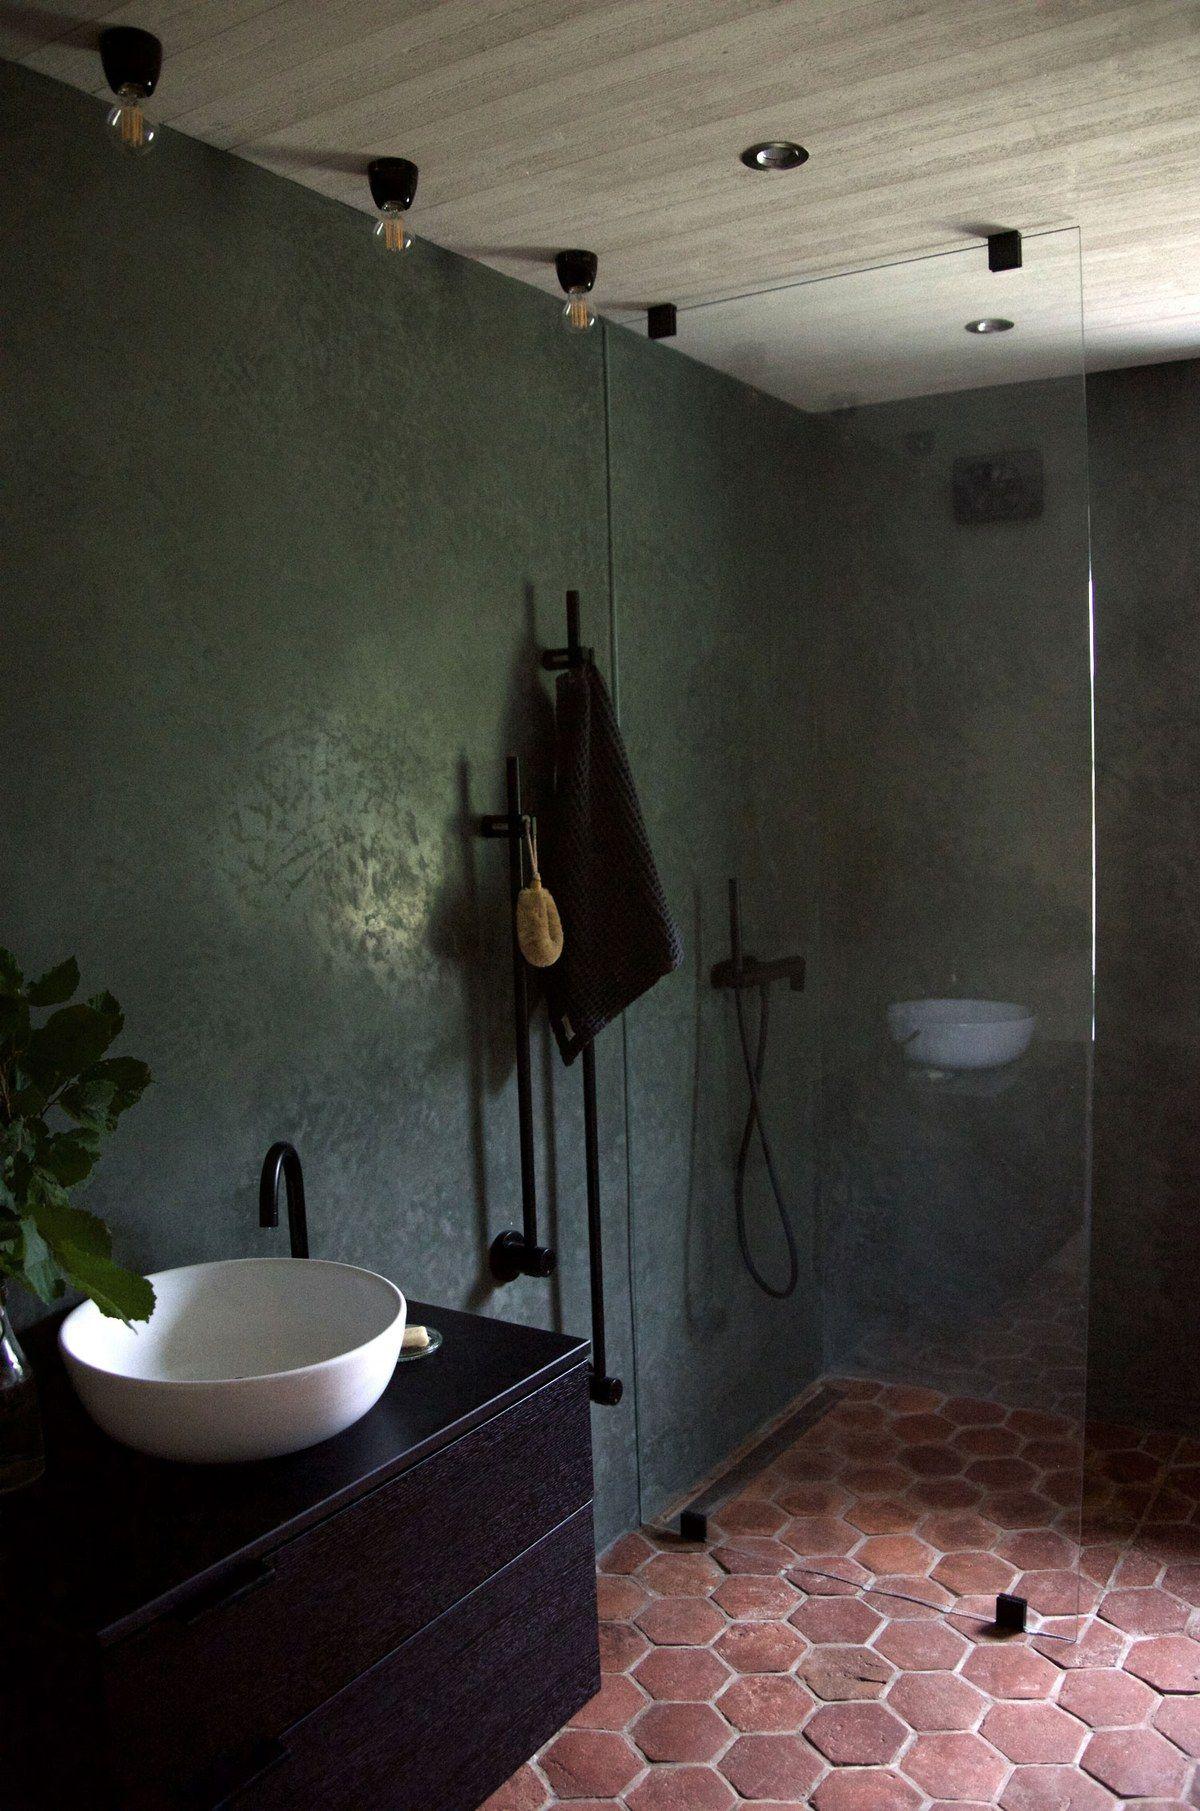 Image Result For Dark Green Glazed Ceramic Tile Bathroom Design Inspiration Unusual Bathrooms Green Bathroom